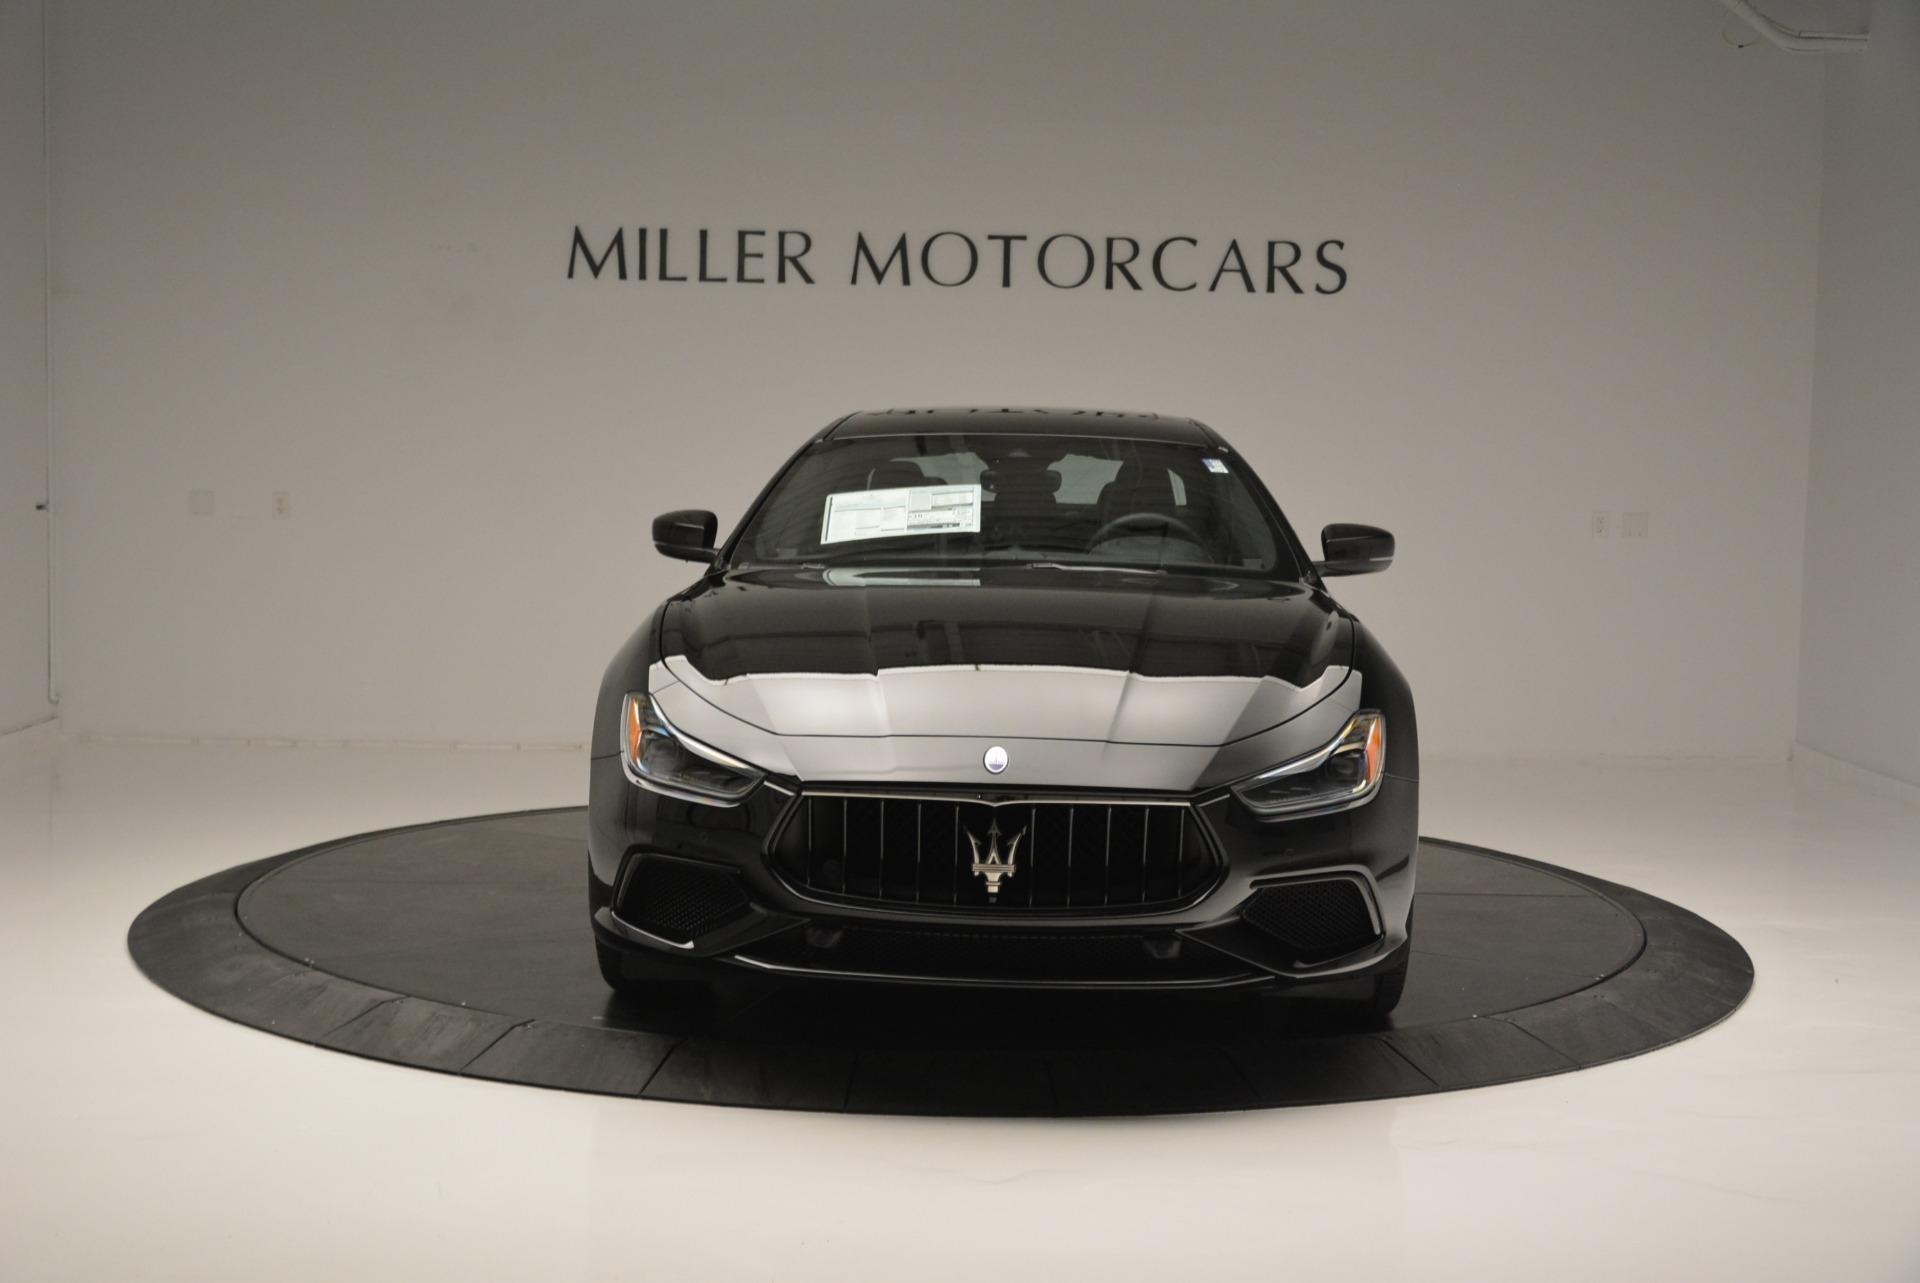 New 2018 Maserati Ghibli SQ4 GranSport Nerissimo For Sale In Westport, CT 2368_p12